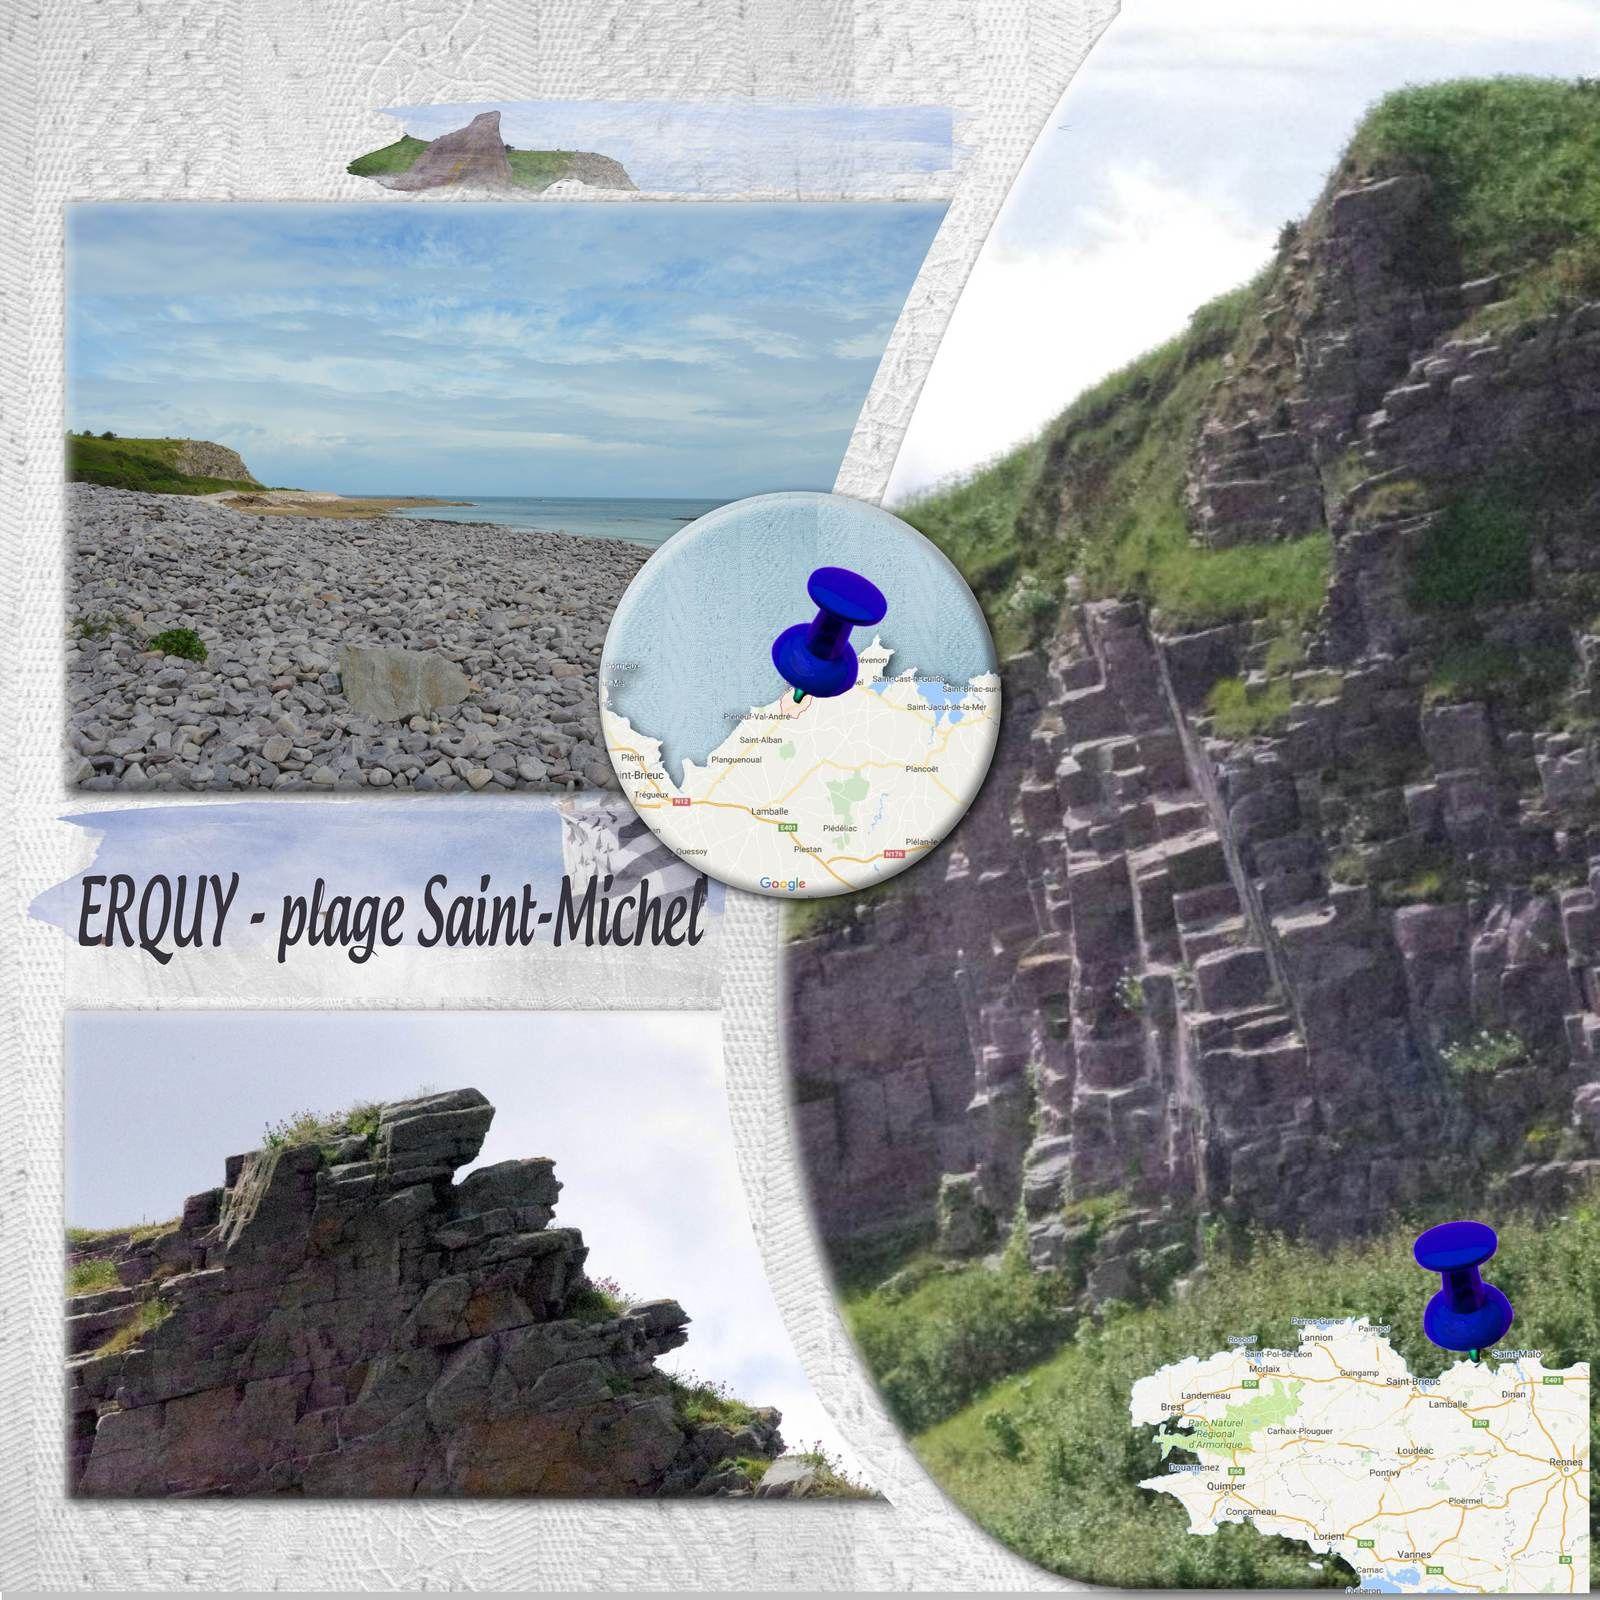 ERQUY - PLAGE ST MICHEL